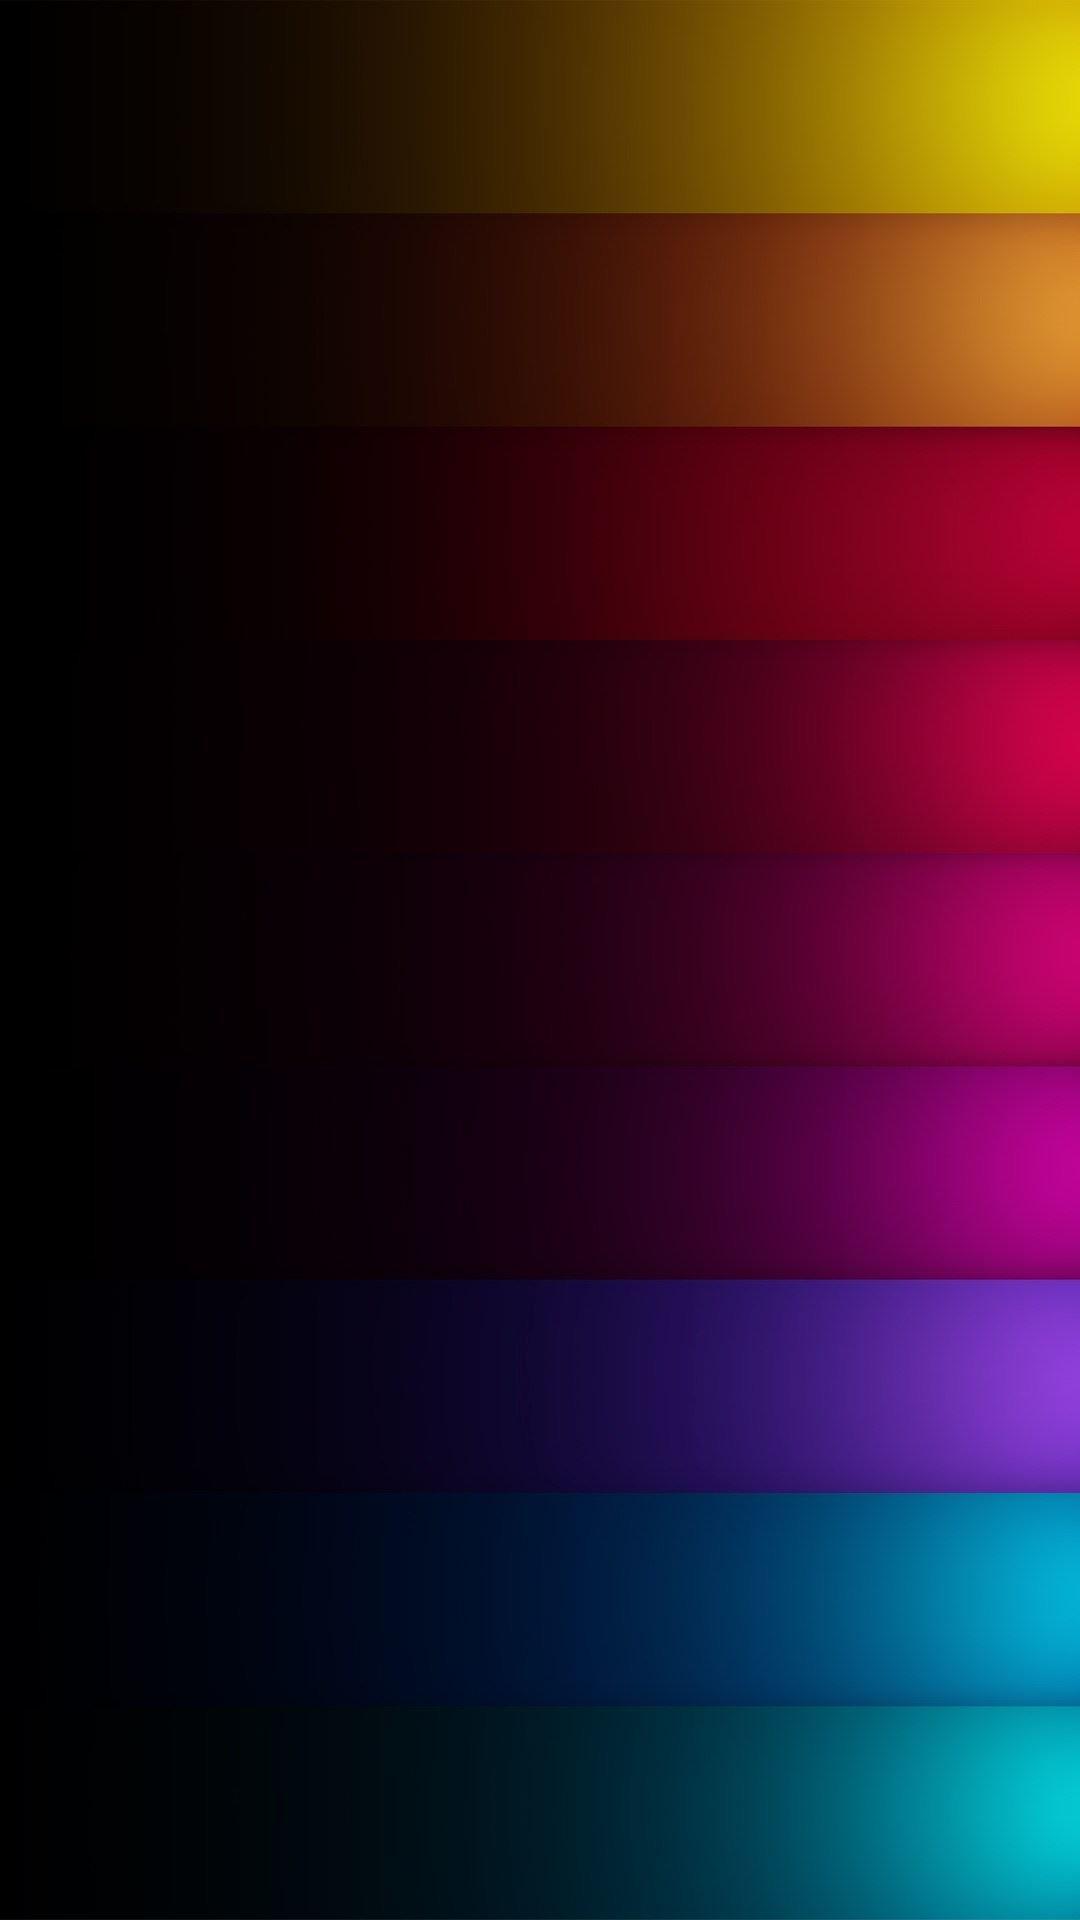 Download Dark Shadow Colored Rainbow Rows Iphone 6 - Dark Ombre Wallpaper Iphone - HD Wallpaper